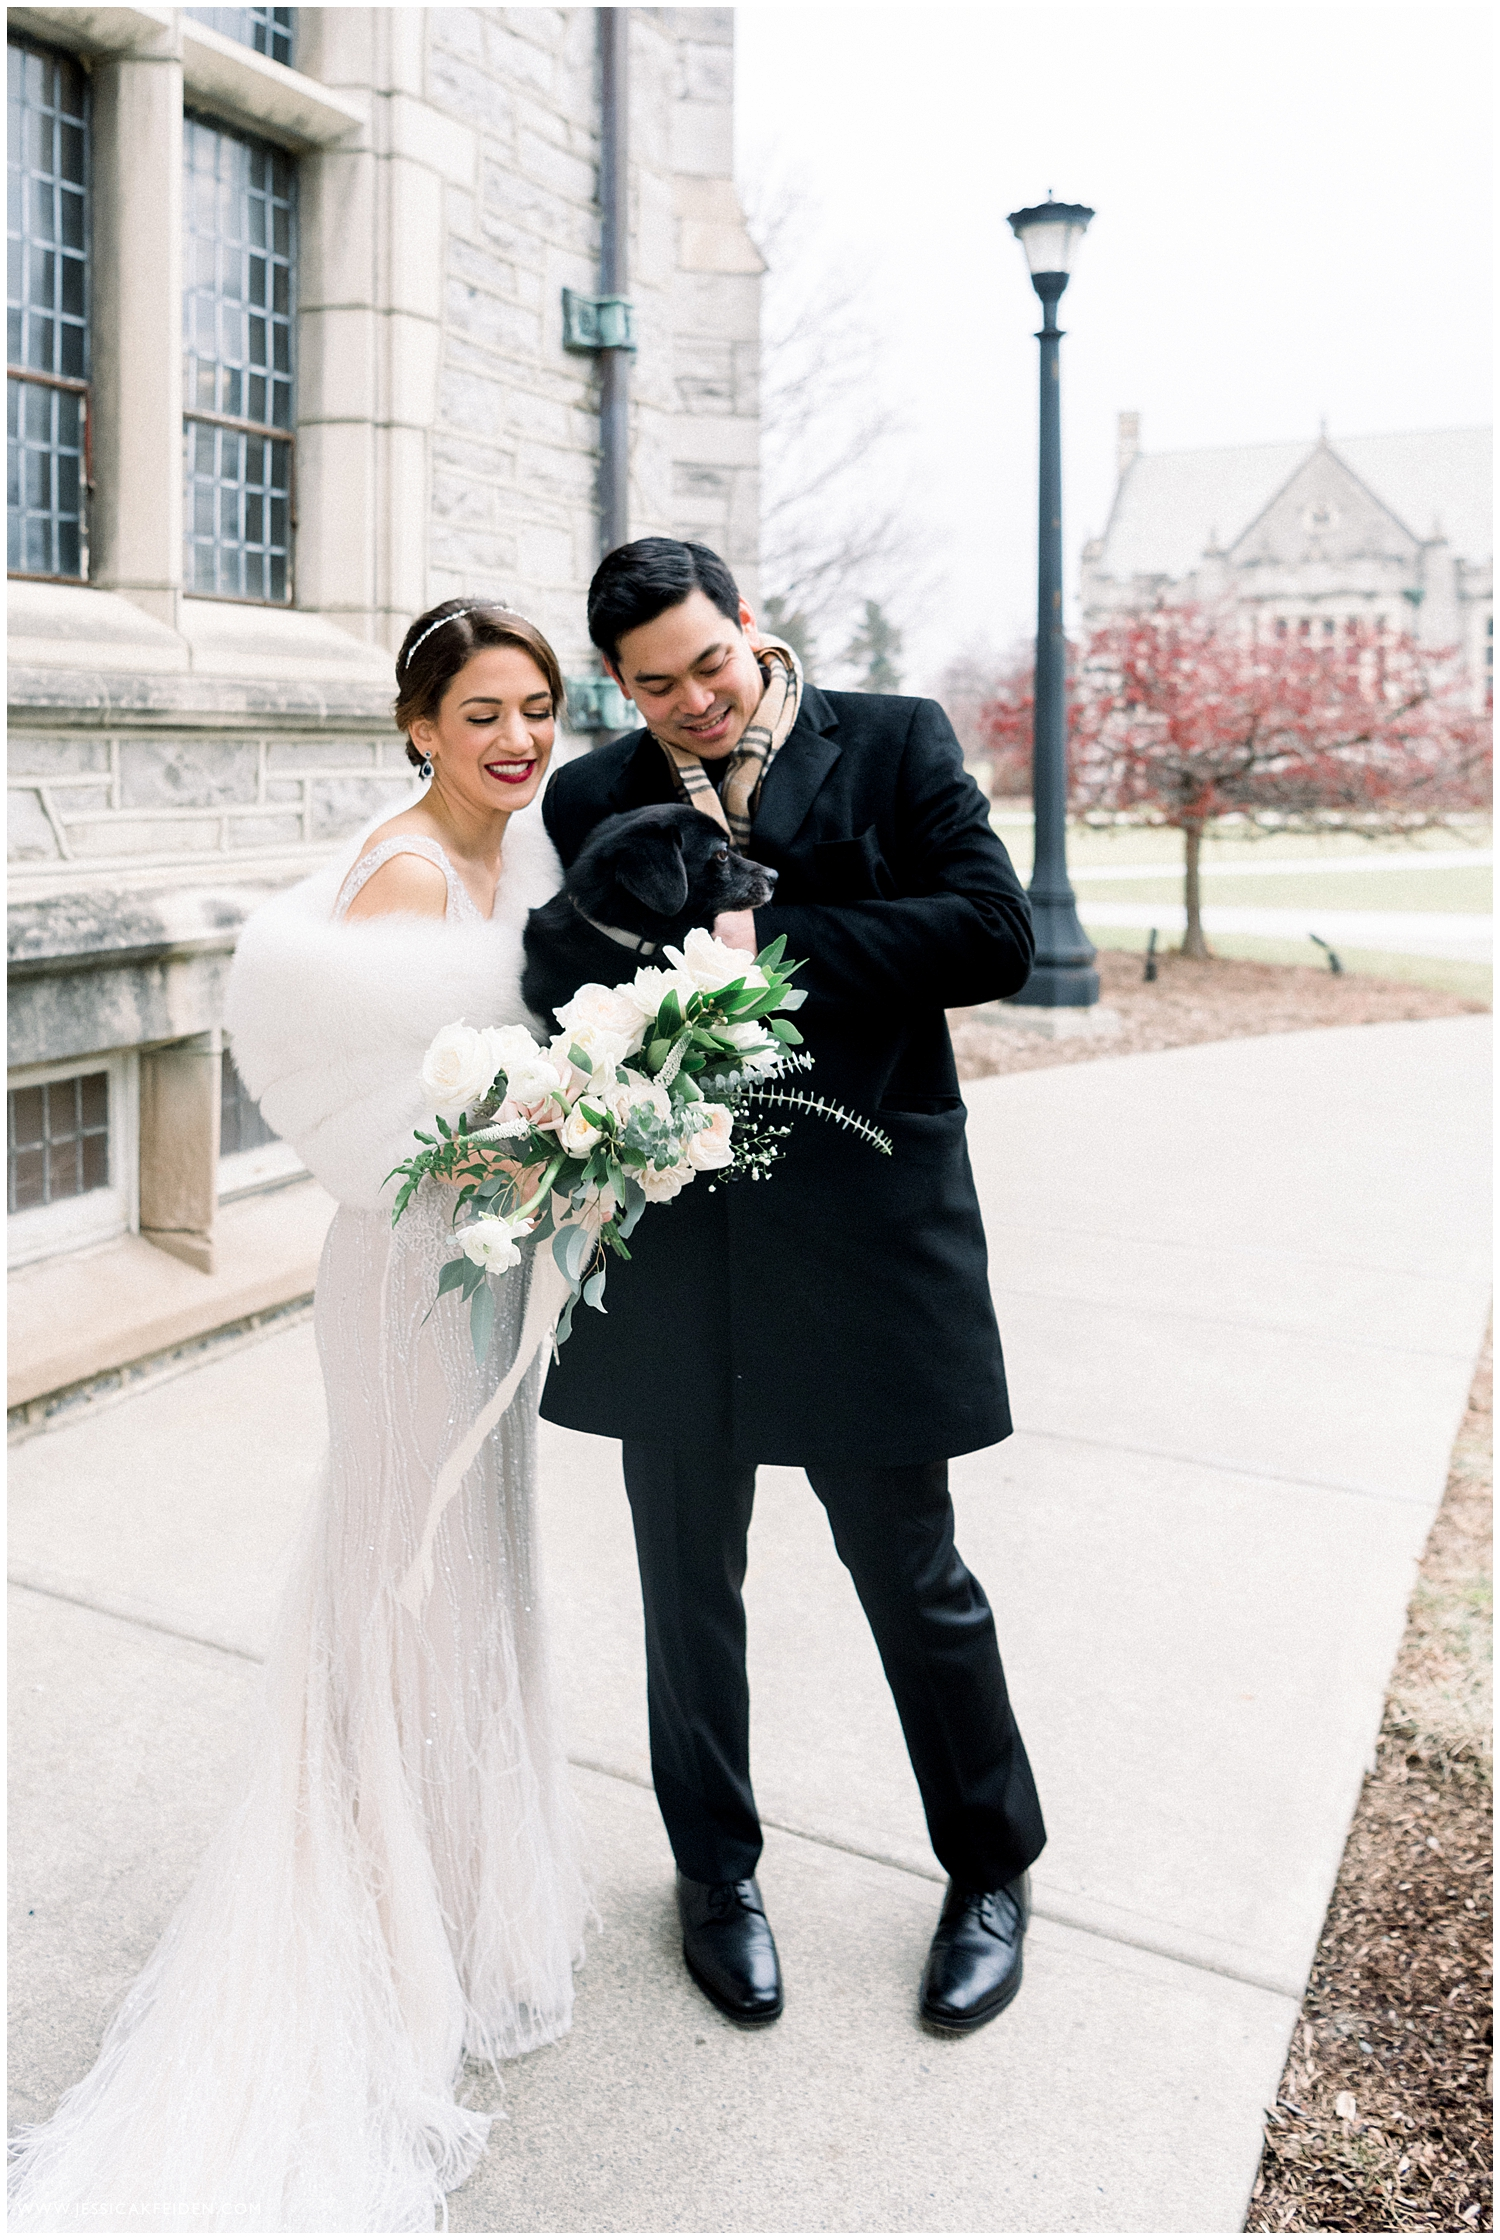 Jessica K Feiden Photography_Emma Willard Franklin Plaza Troy New York Wedding Photographer_0029.jpg